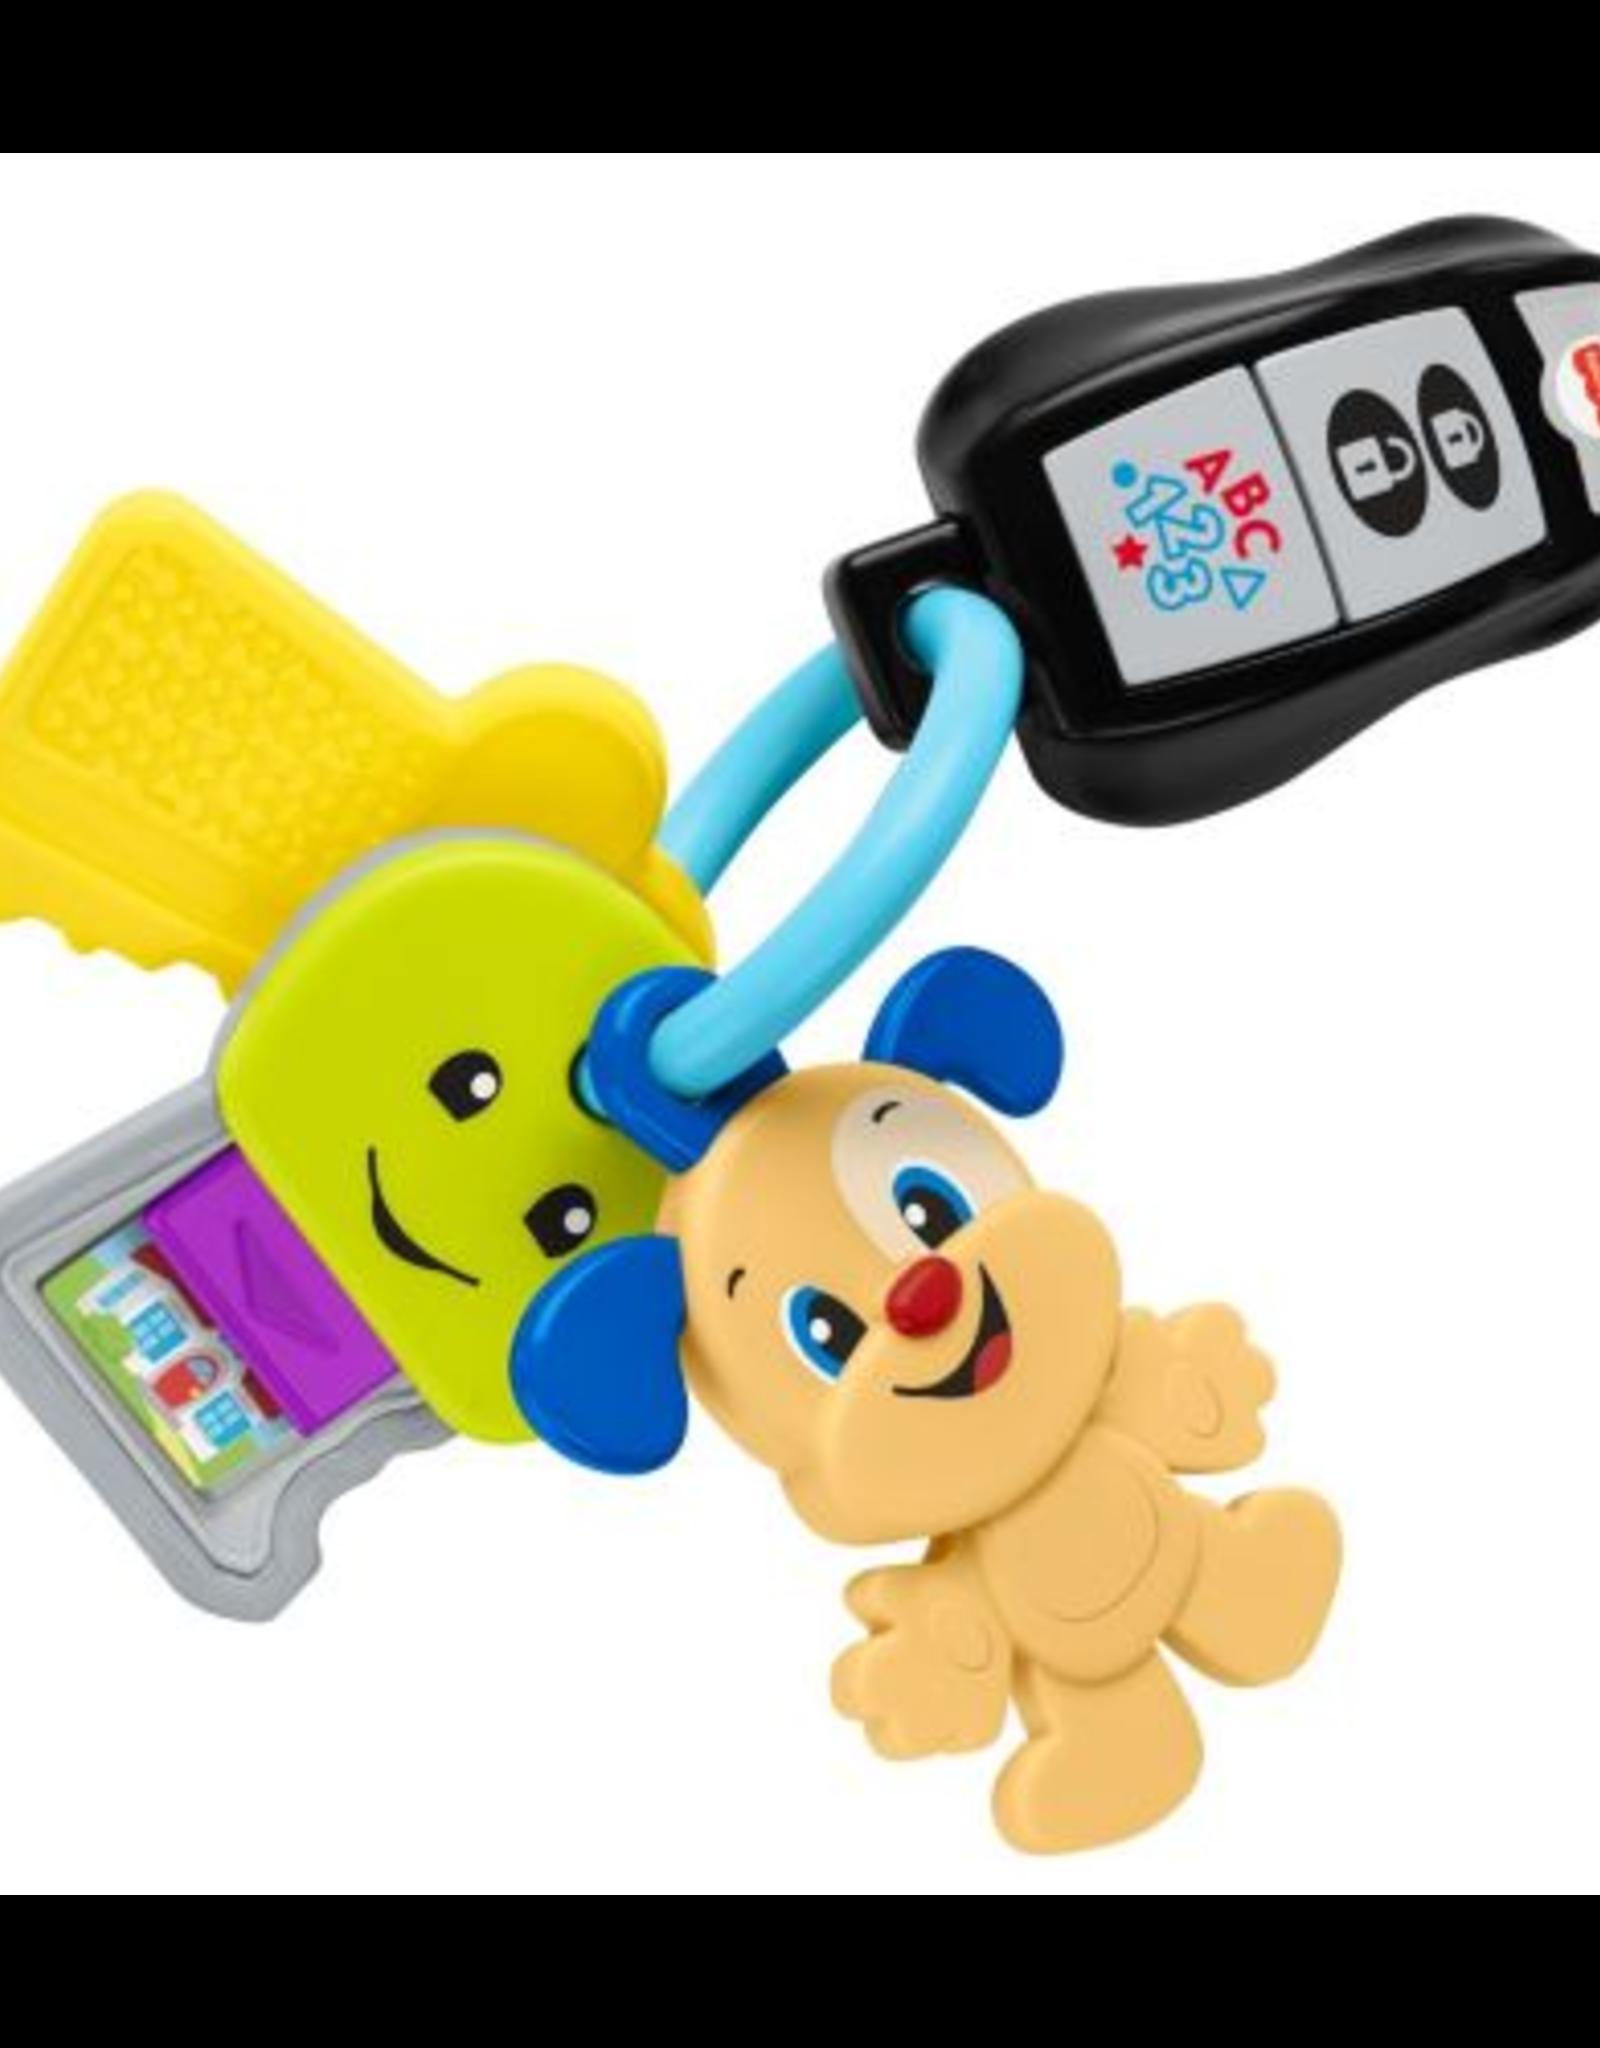 Fisher Price LNL Play & Go Keys